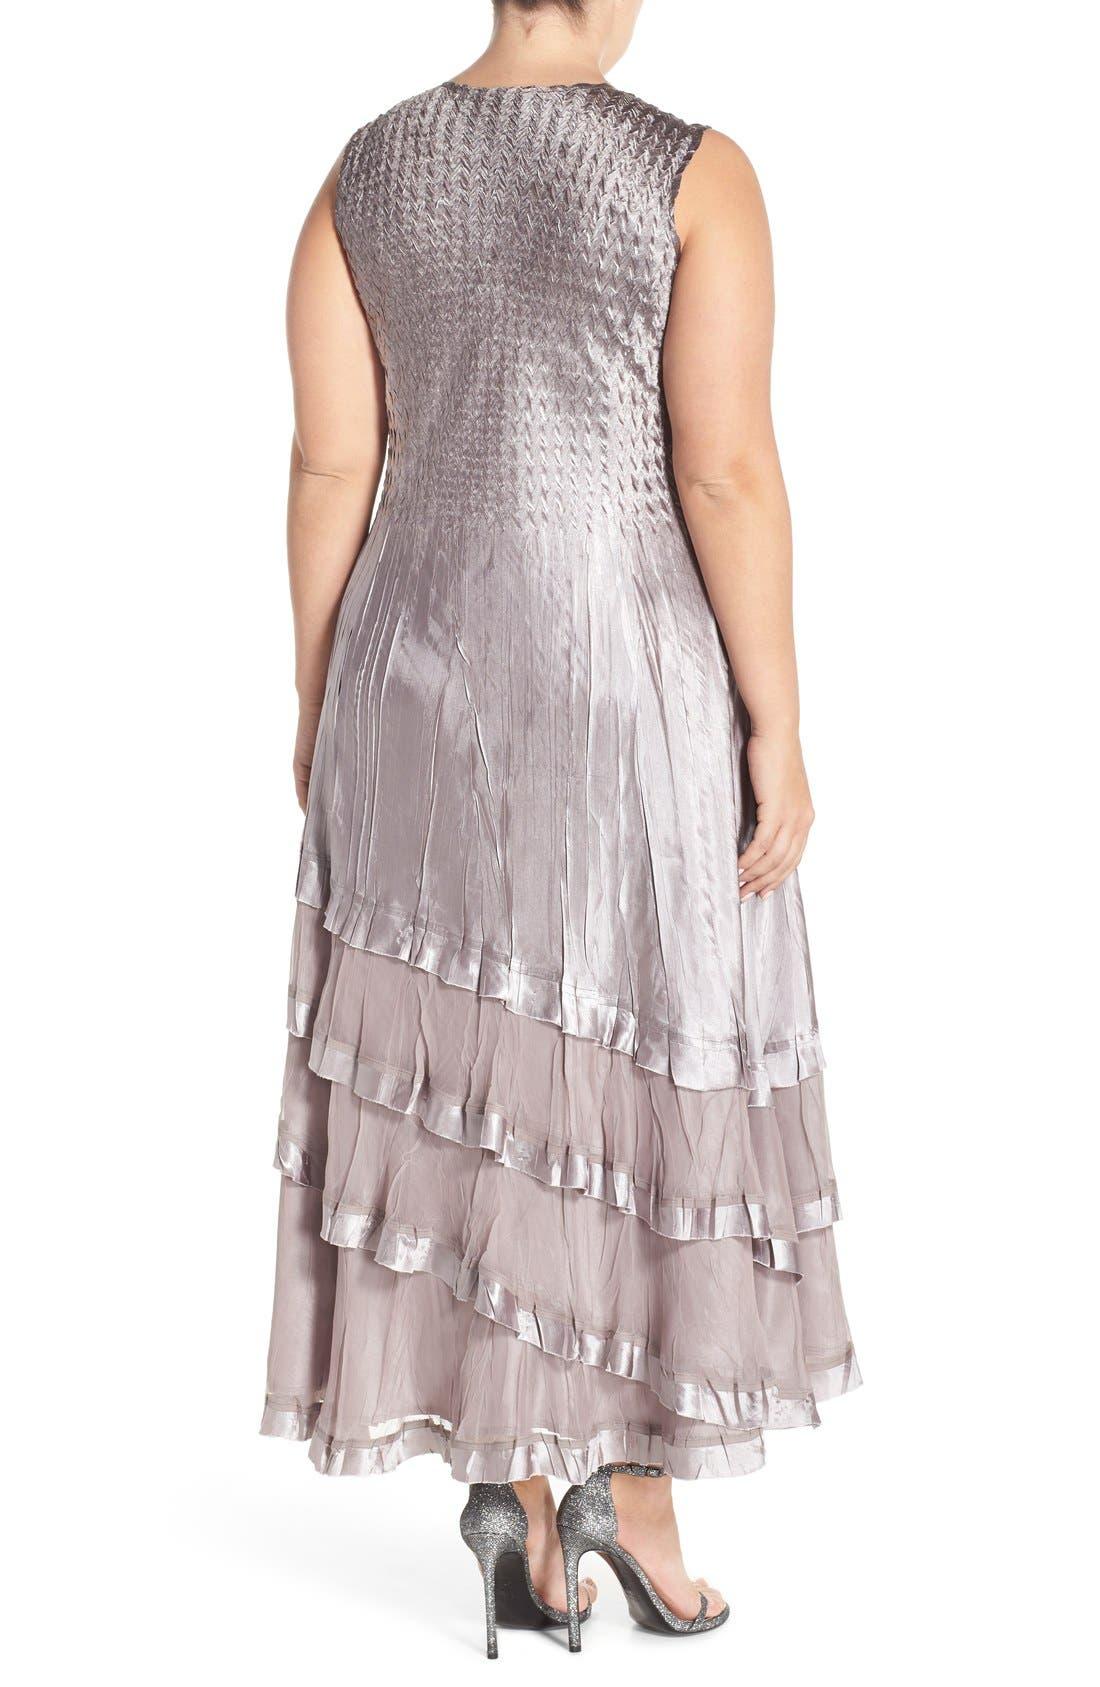 KOMAROV, Charmeuse Tiered Hem Dress with Chiffon Jacket, Alternate thumbnail 7, color, OYSTER SMOKE OMBRE